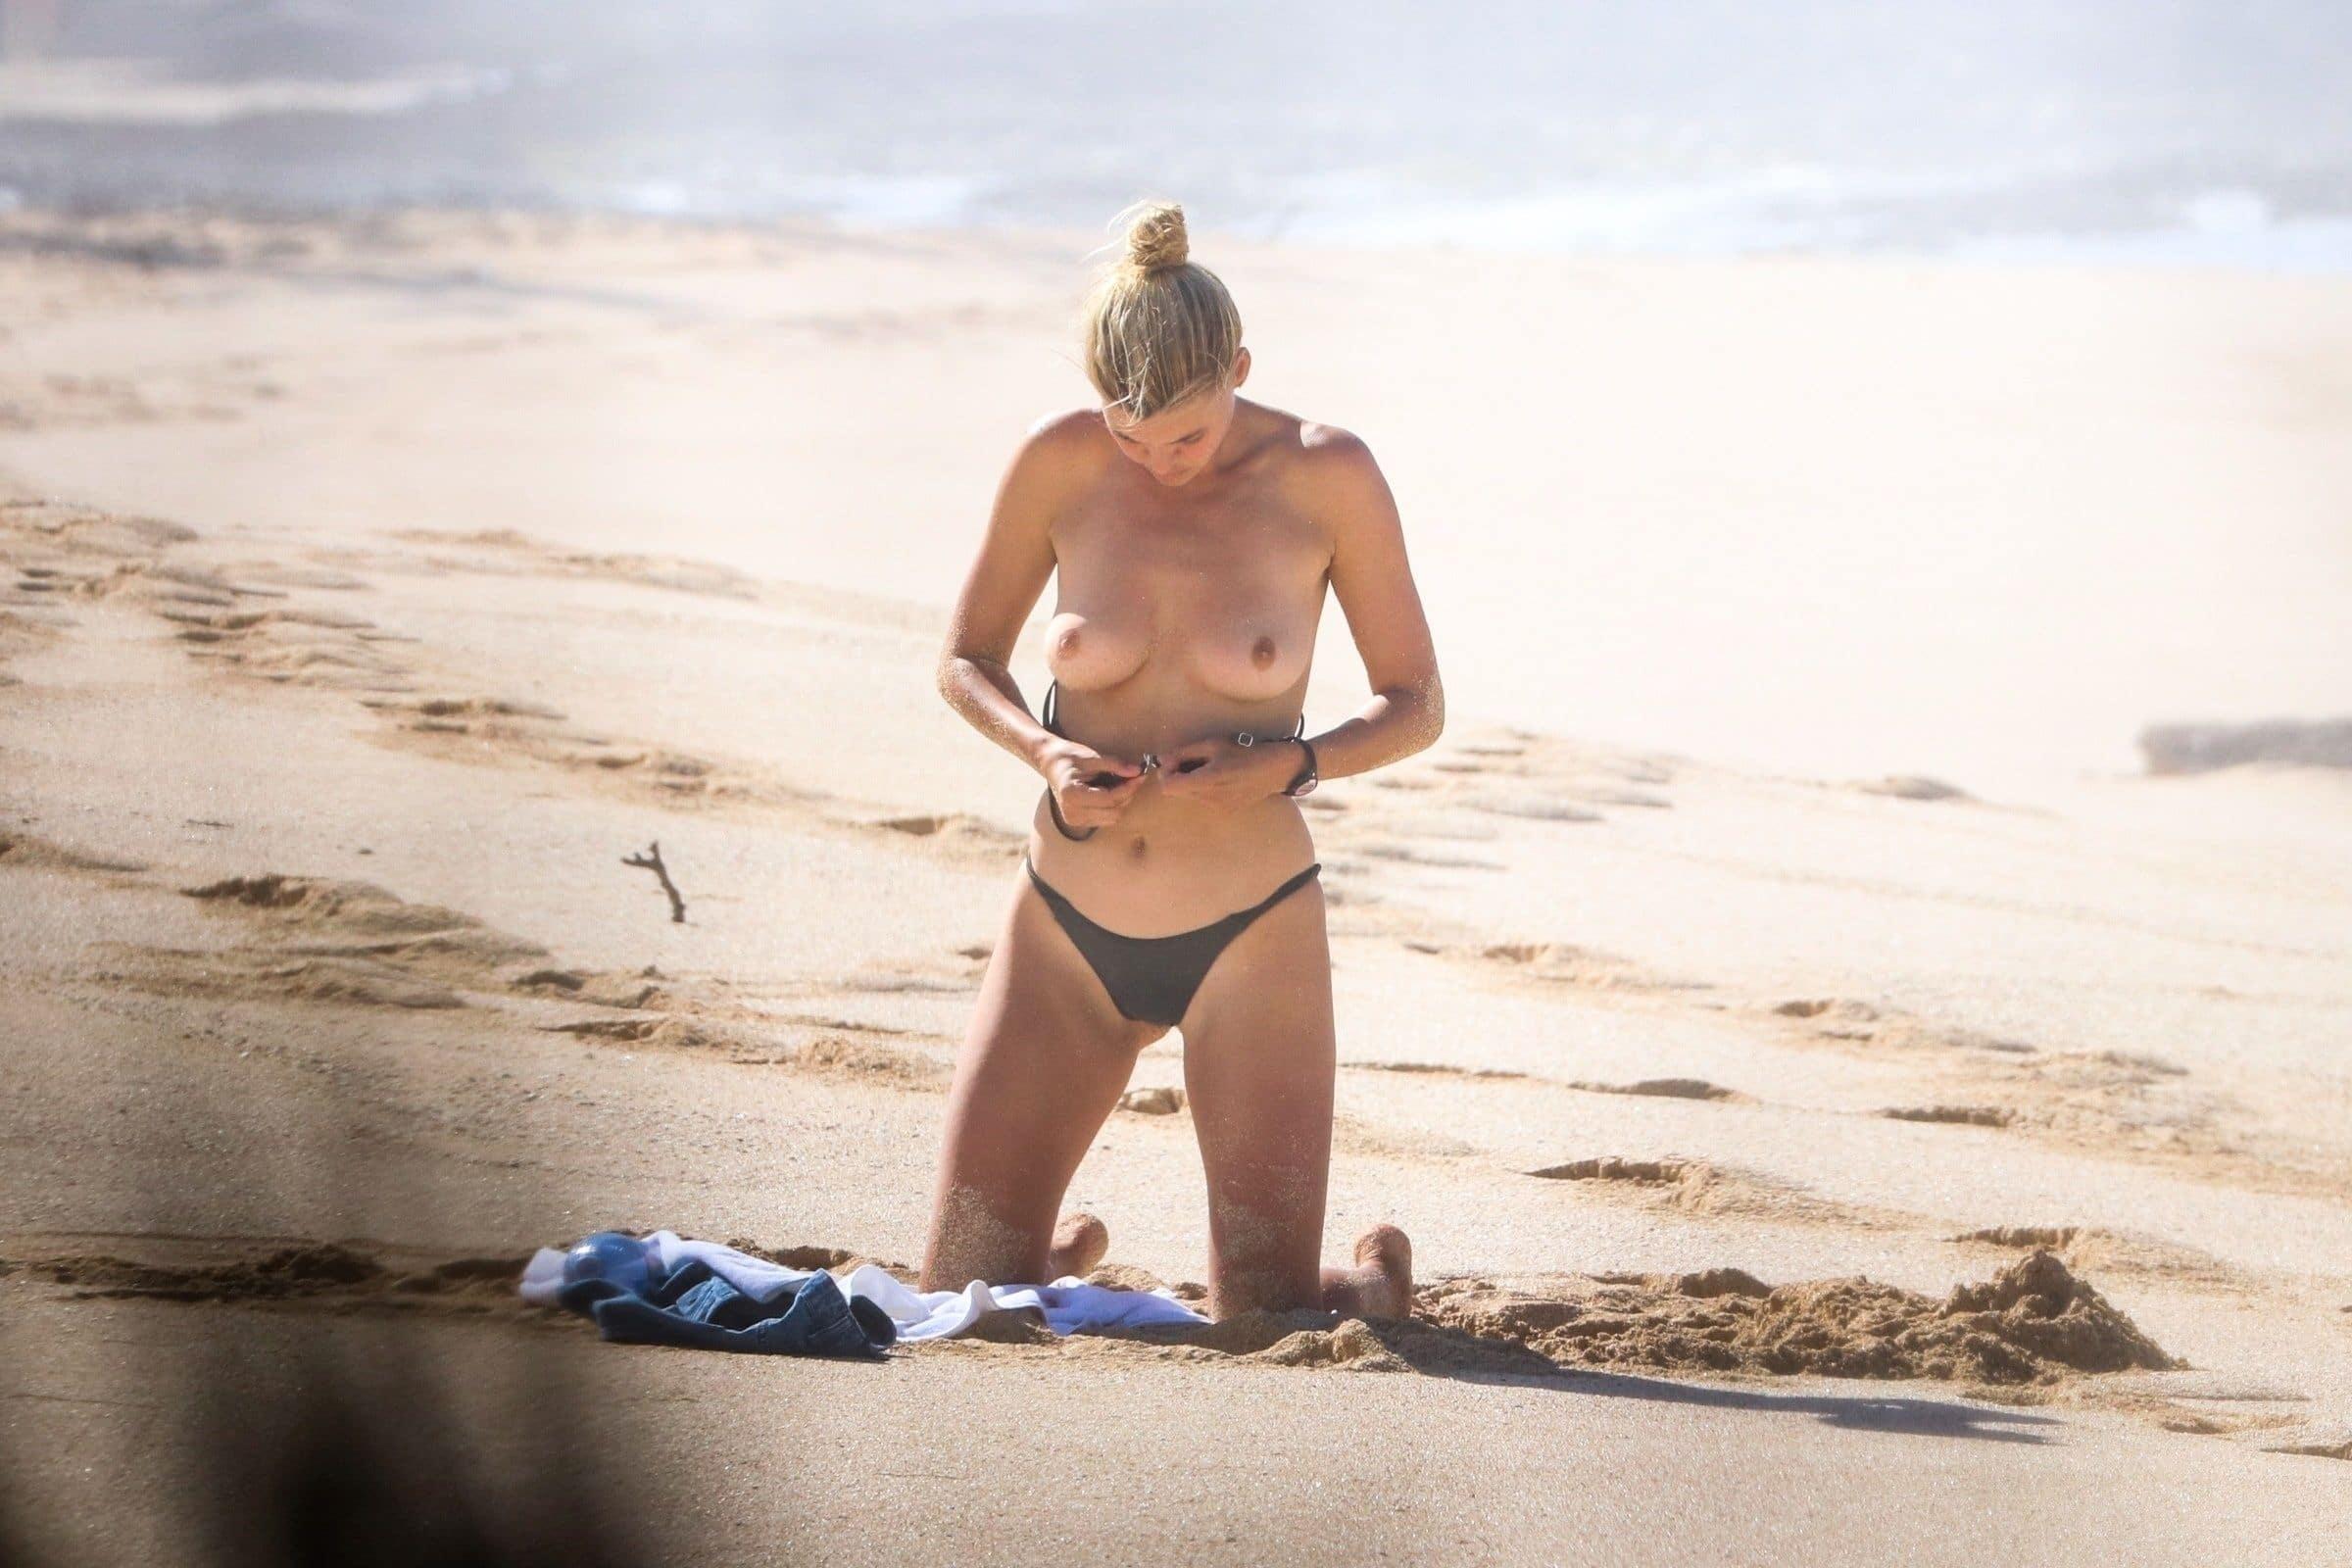 Kelly Rohrbach booty